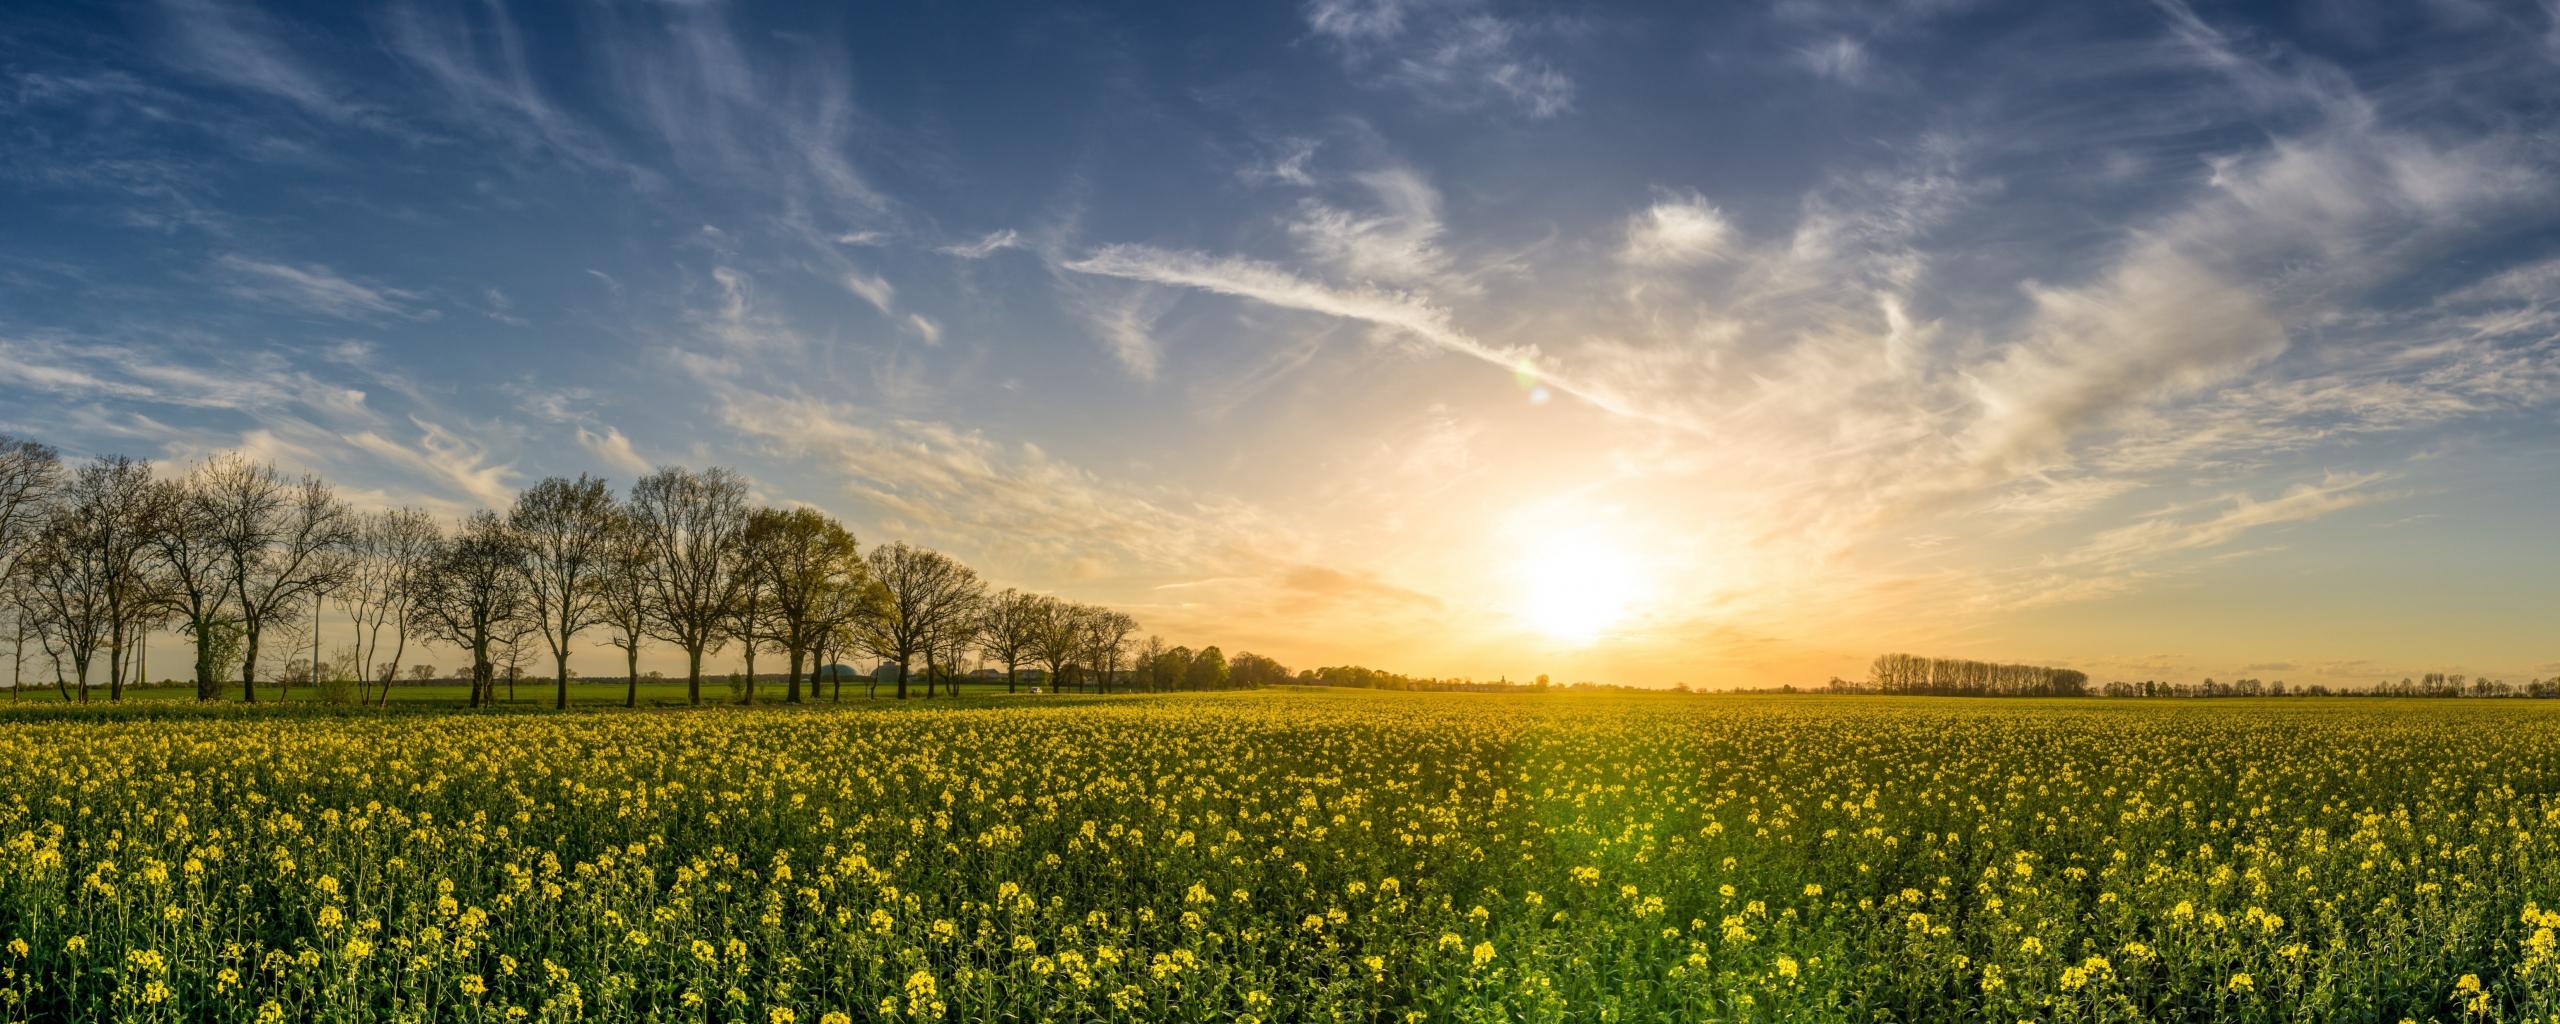 Oilseed rape, farm, sunny day, sky, 5k, 2560x1024 wallpaper